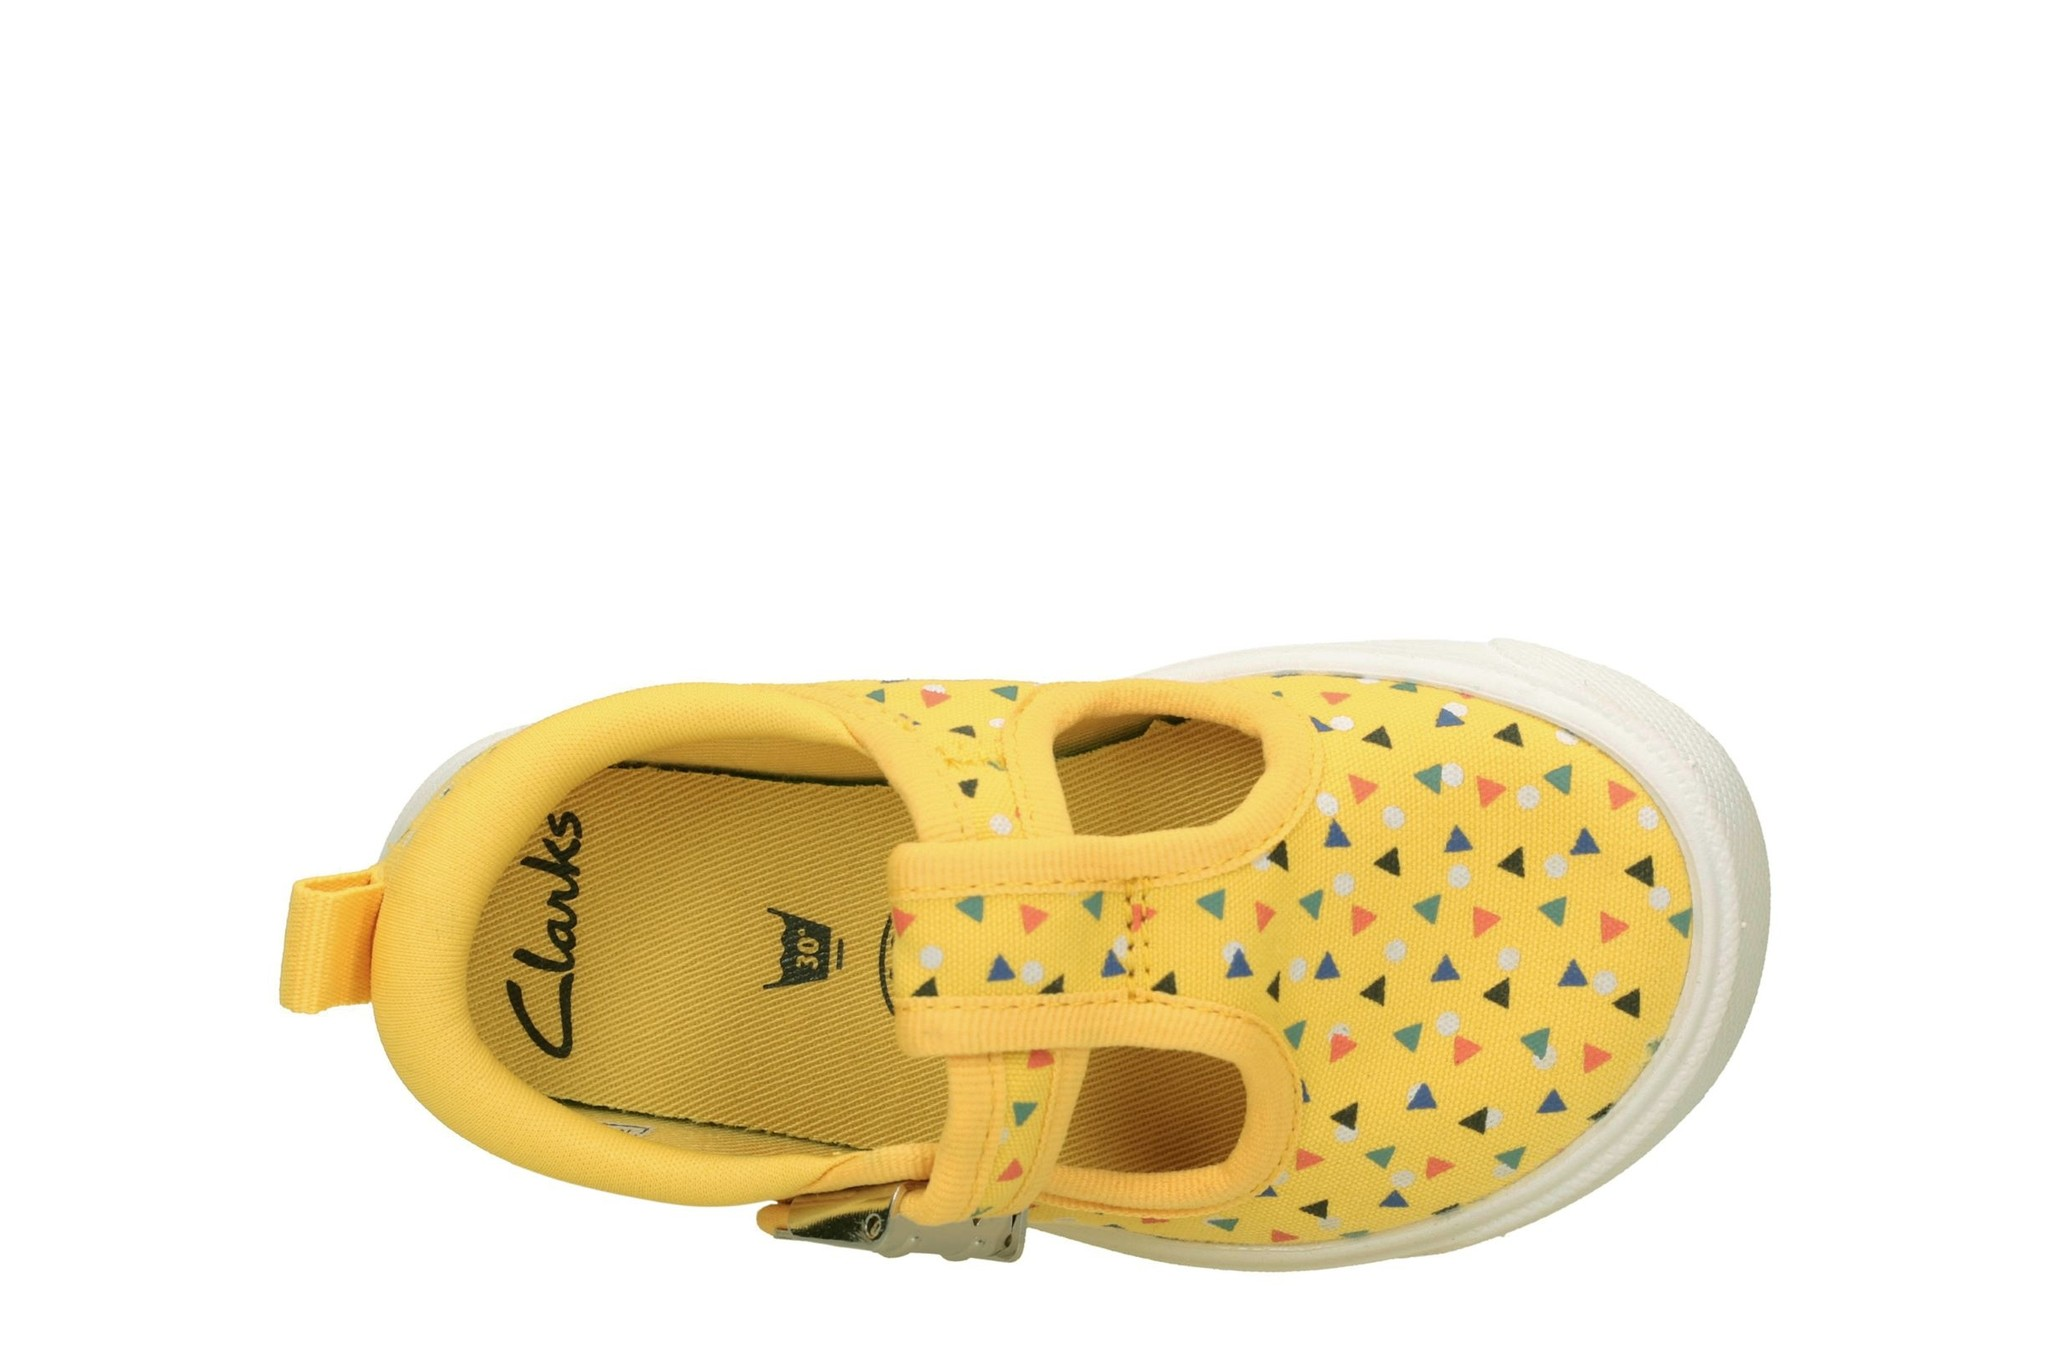 Clarks City Spark Yellow